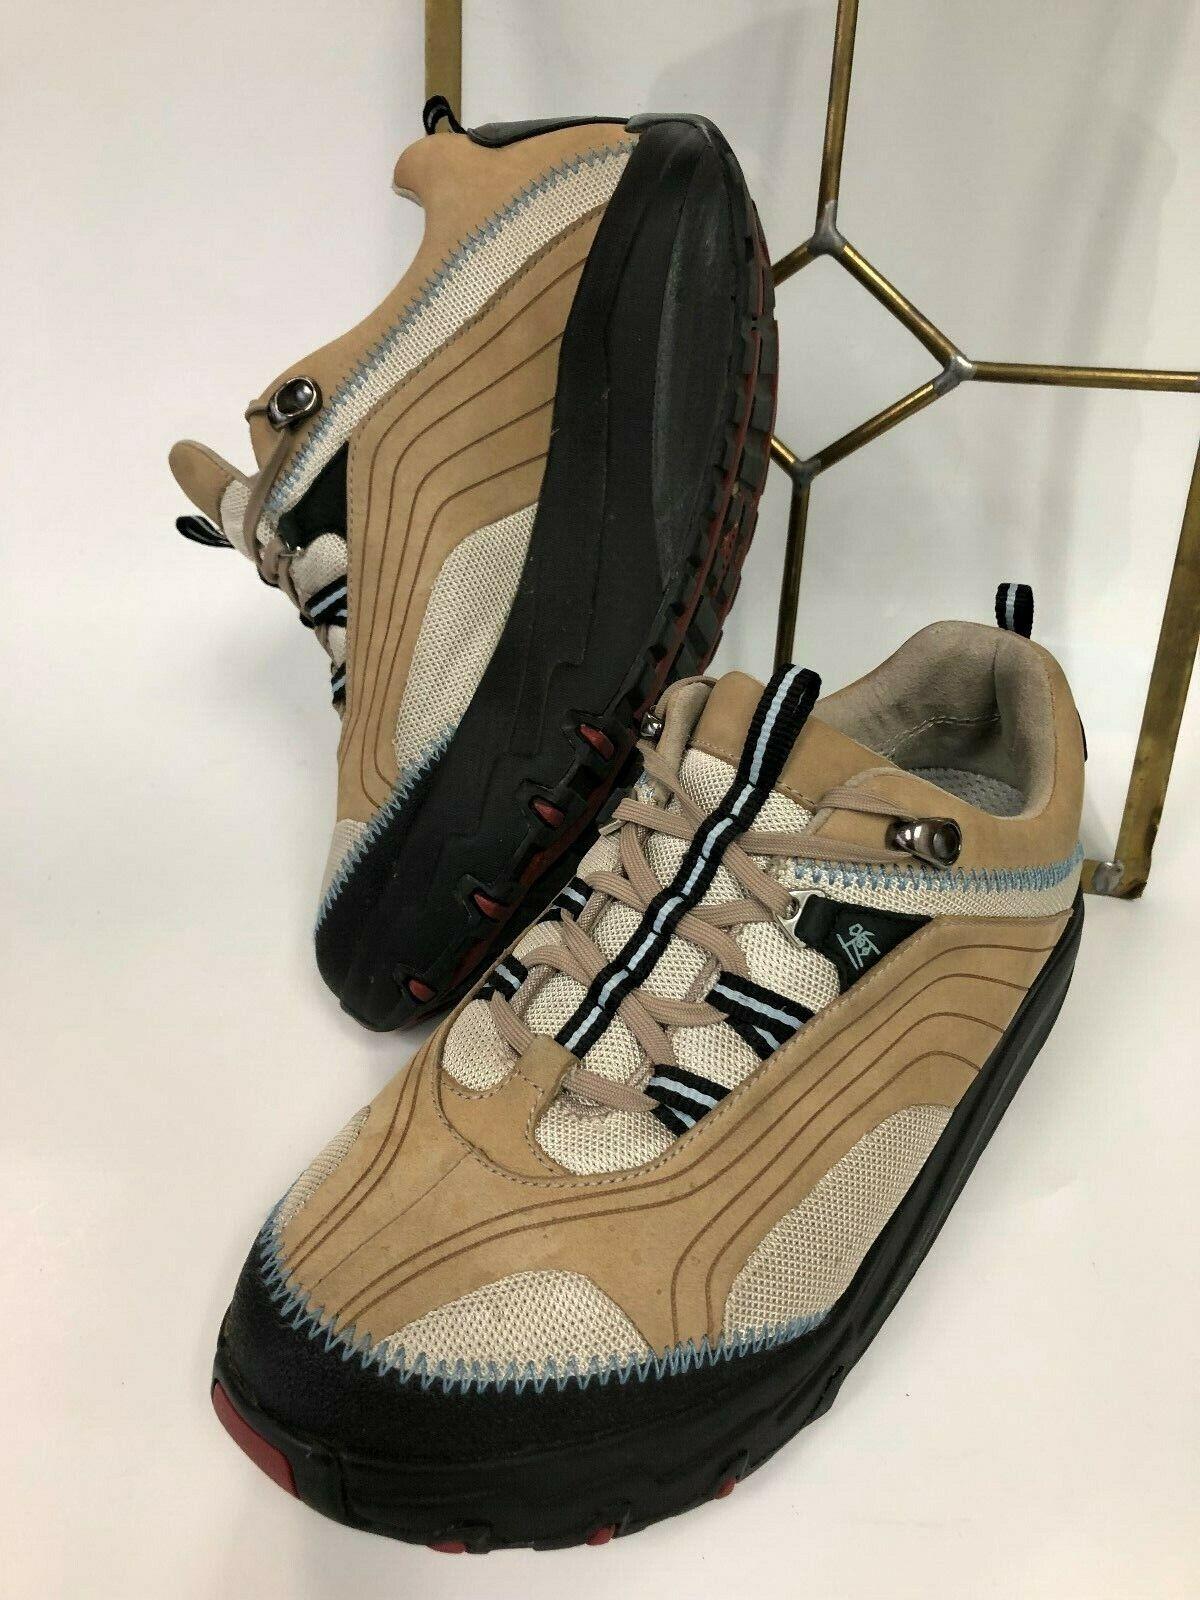 MBT Chapa Tan Gore Tex Womens 9M Fitness Tone Athletic shoes GUC